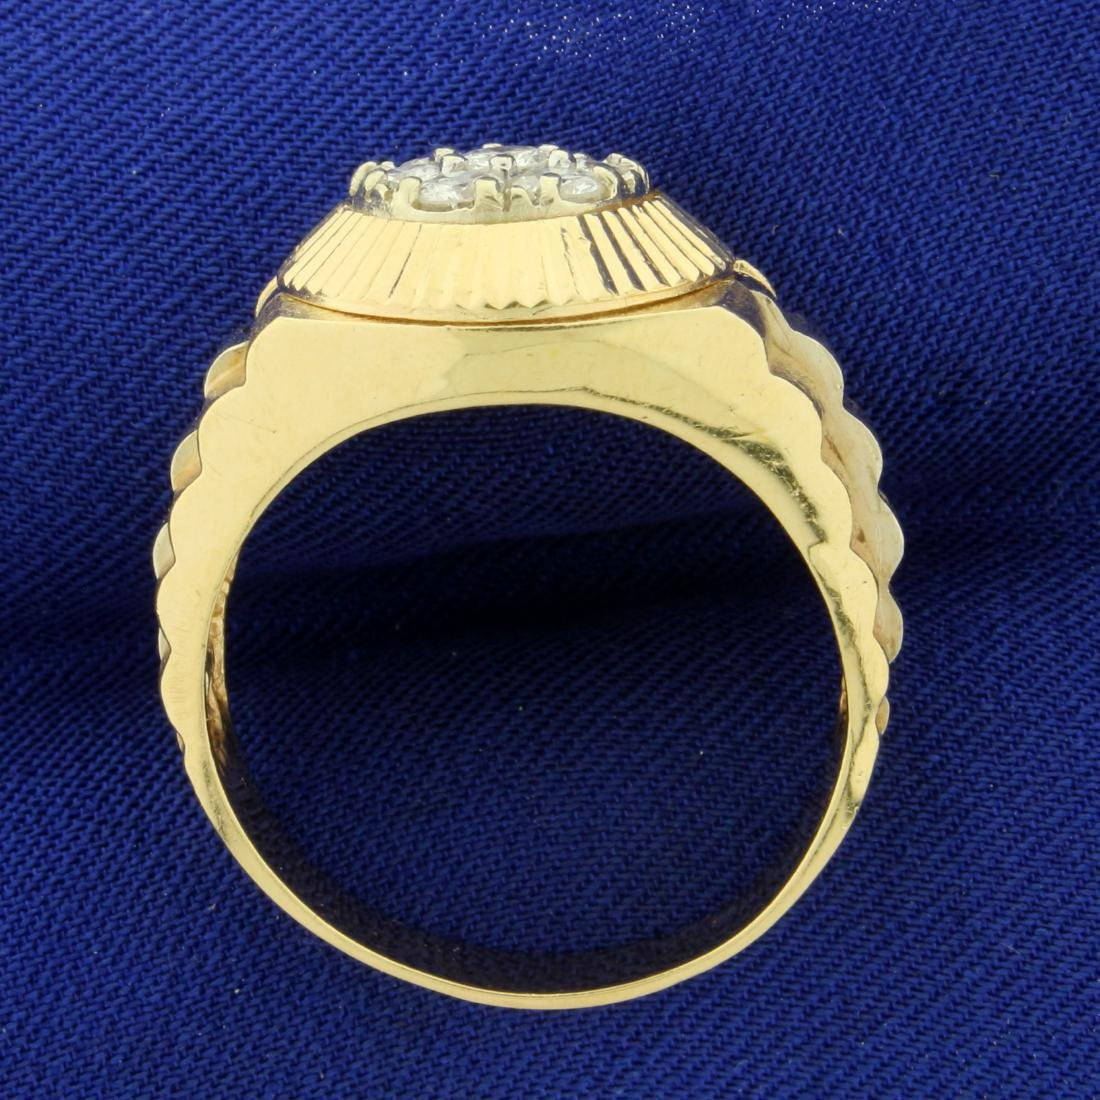 1ct TW Men's Diamond Ring in 14K Yellow Gold - 3